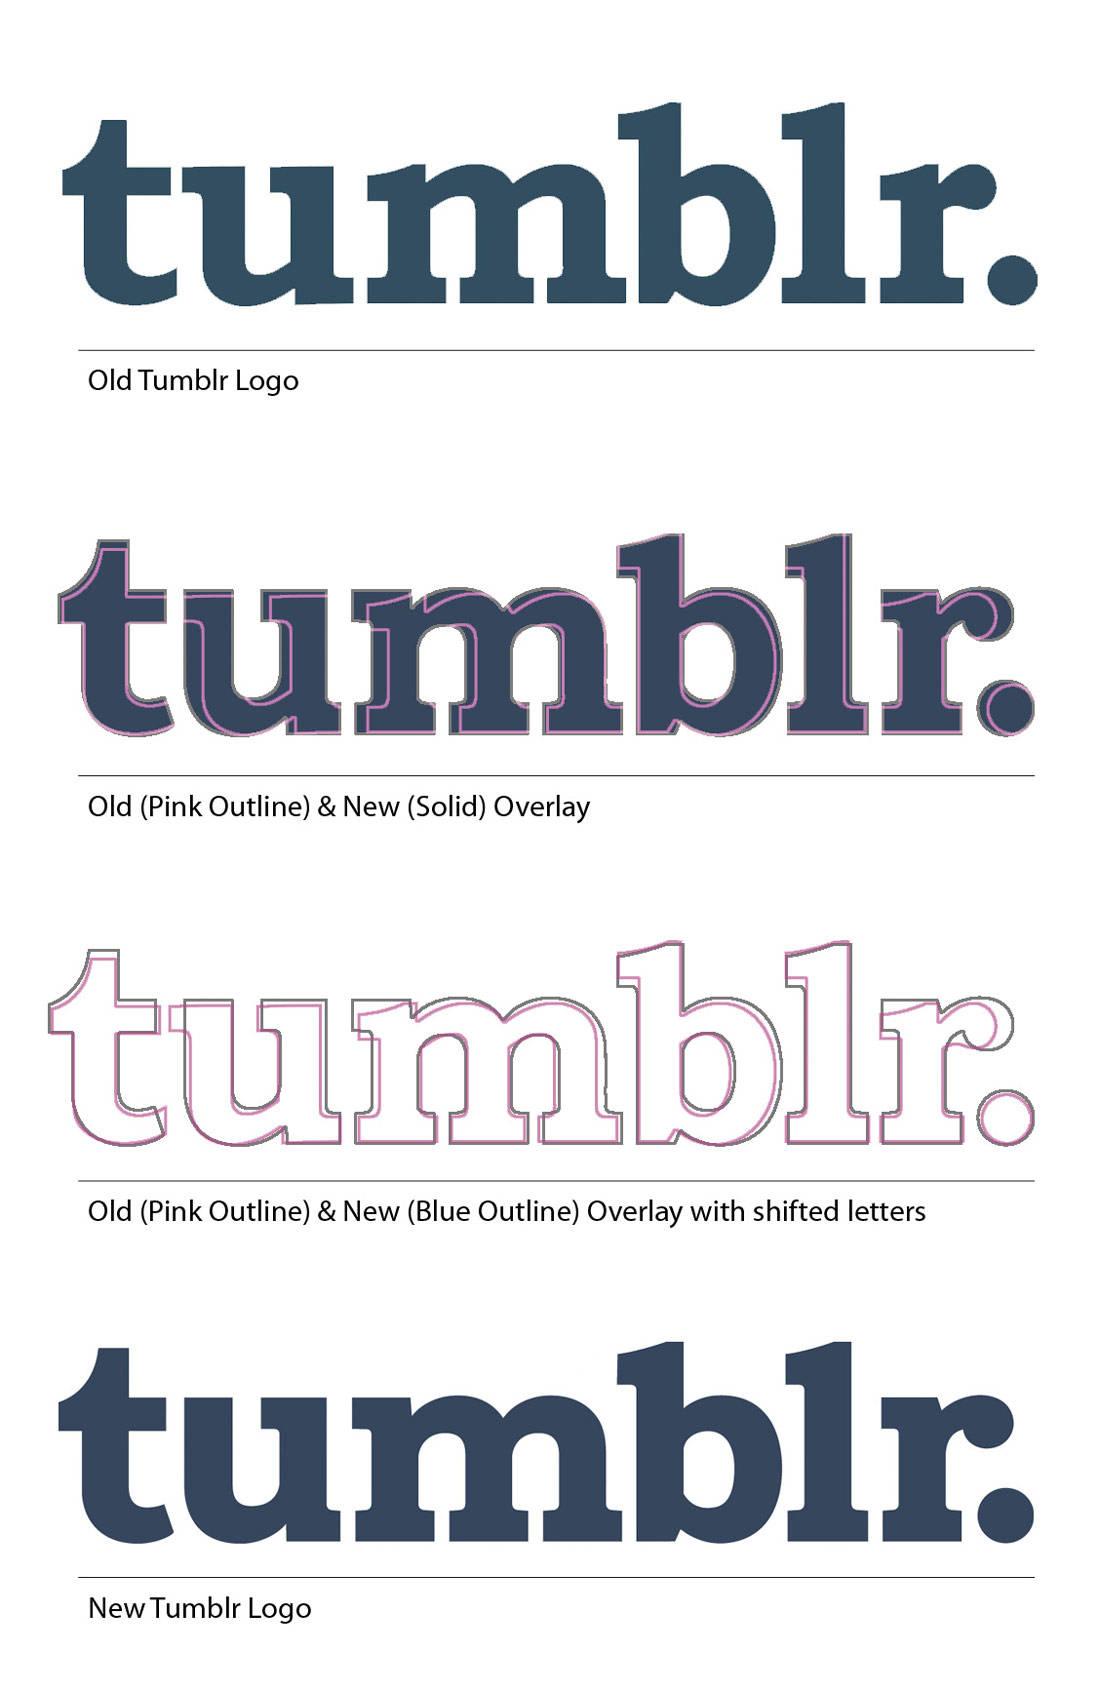 New & Old Tumblr Logo Comparison